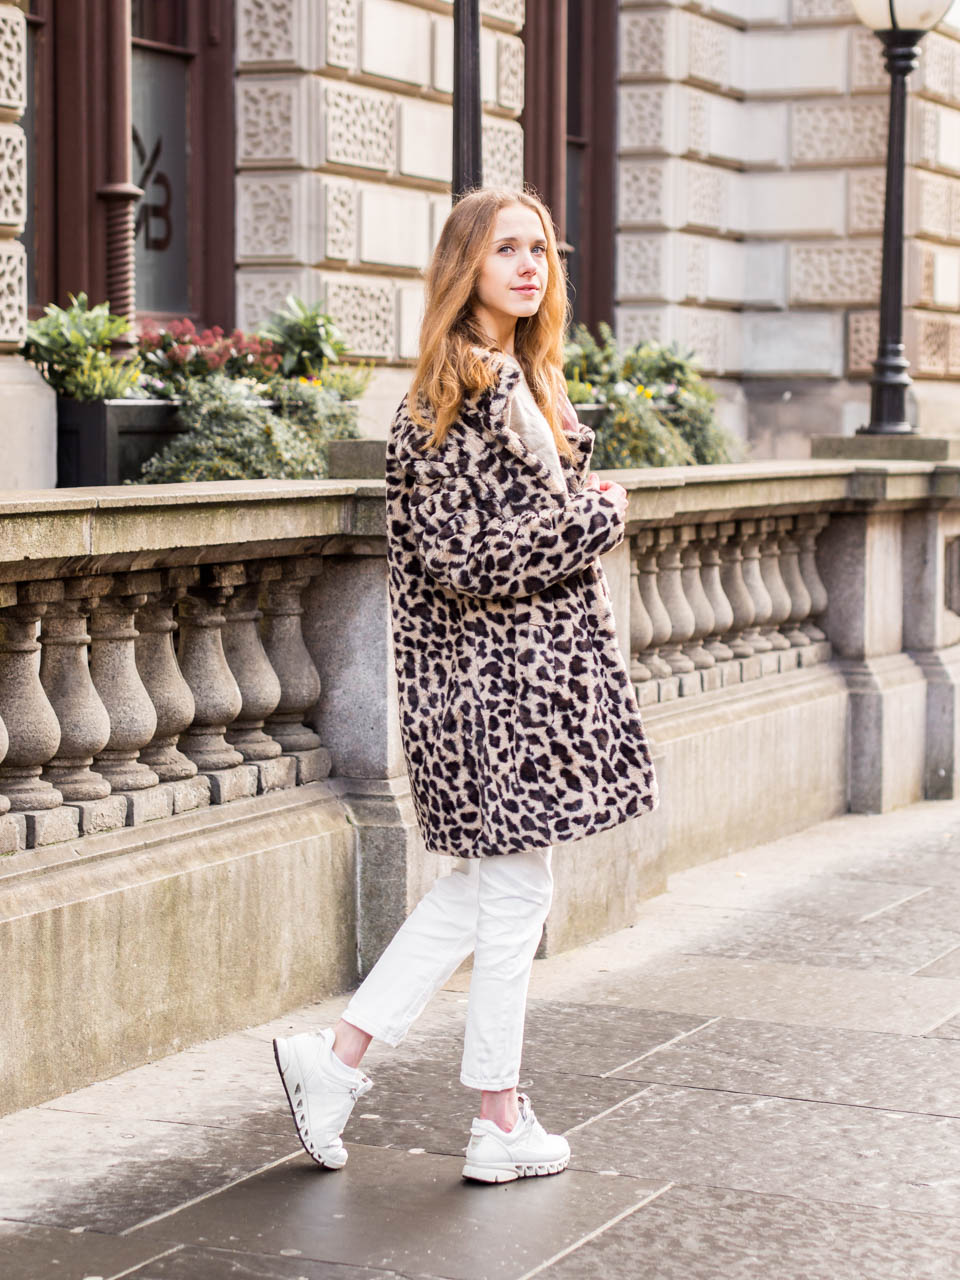 Fashion blogger autumn outfit 2019 - Muotibloggaaja, syysasu 2019